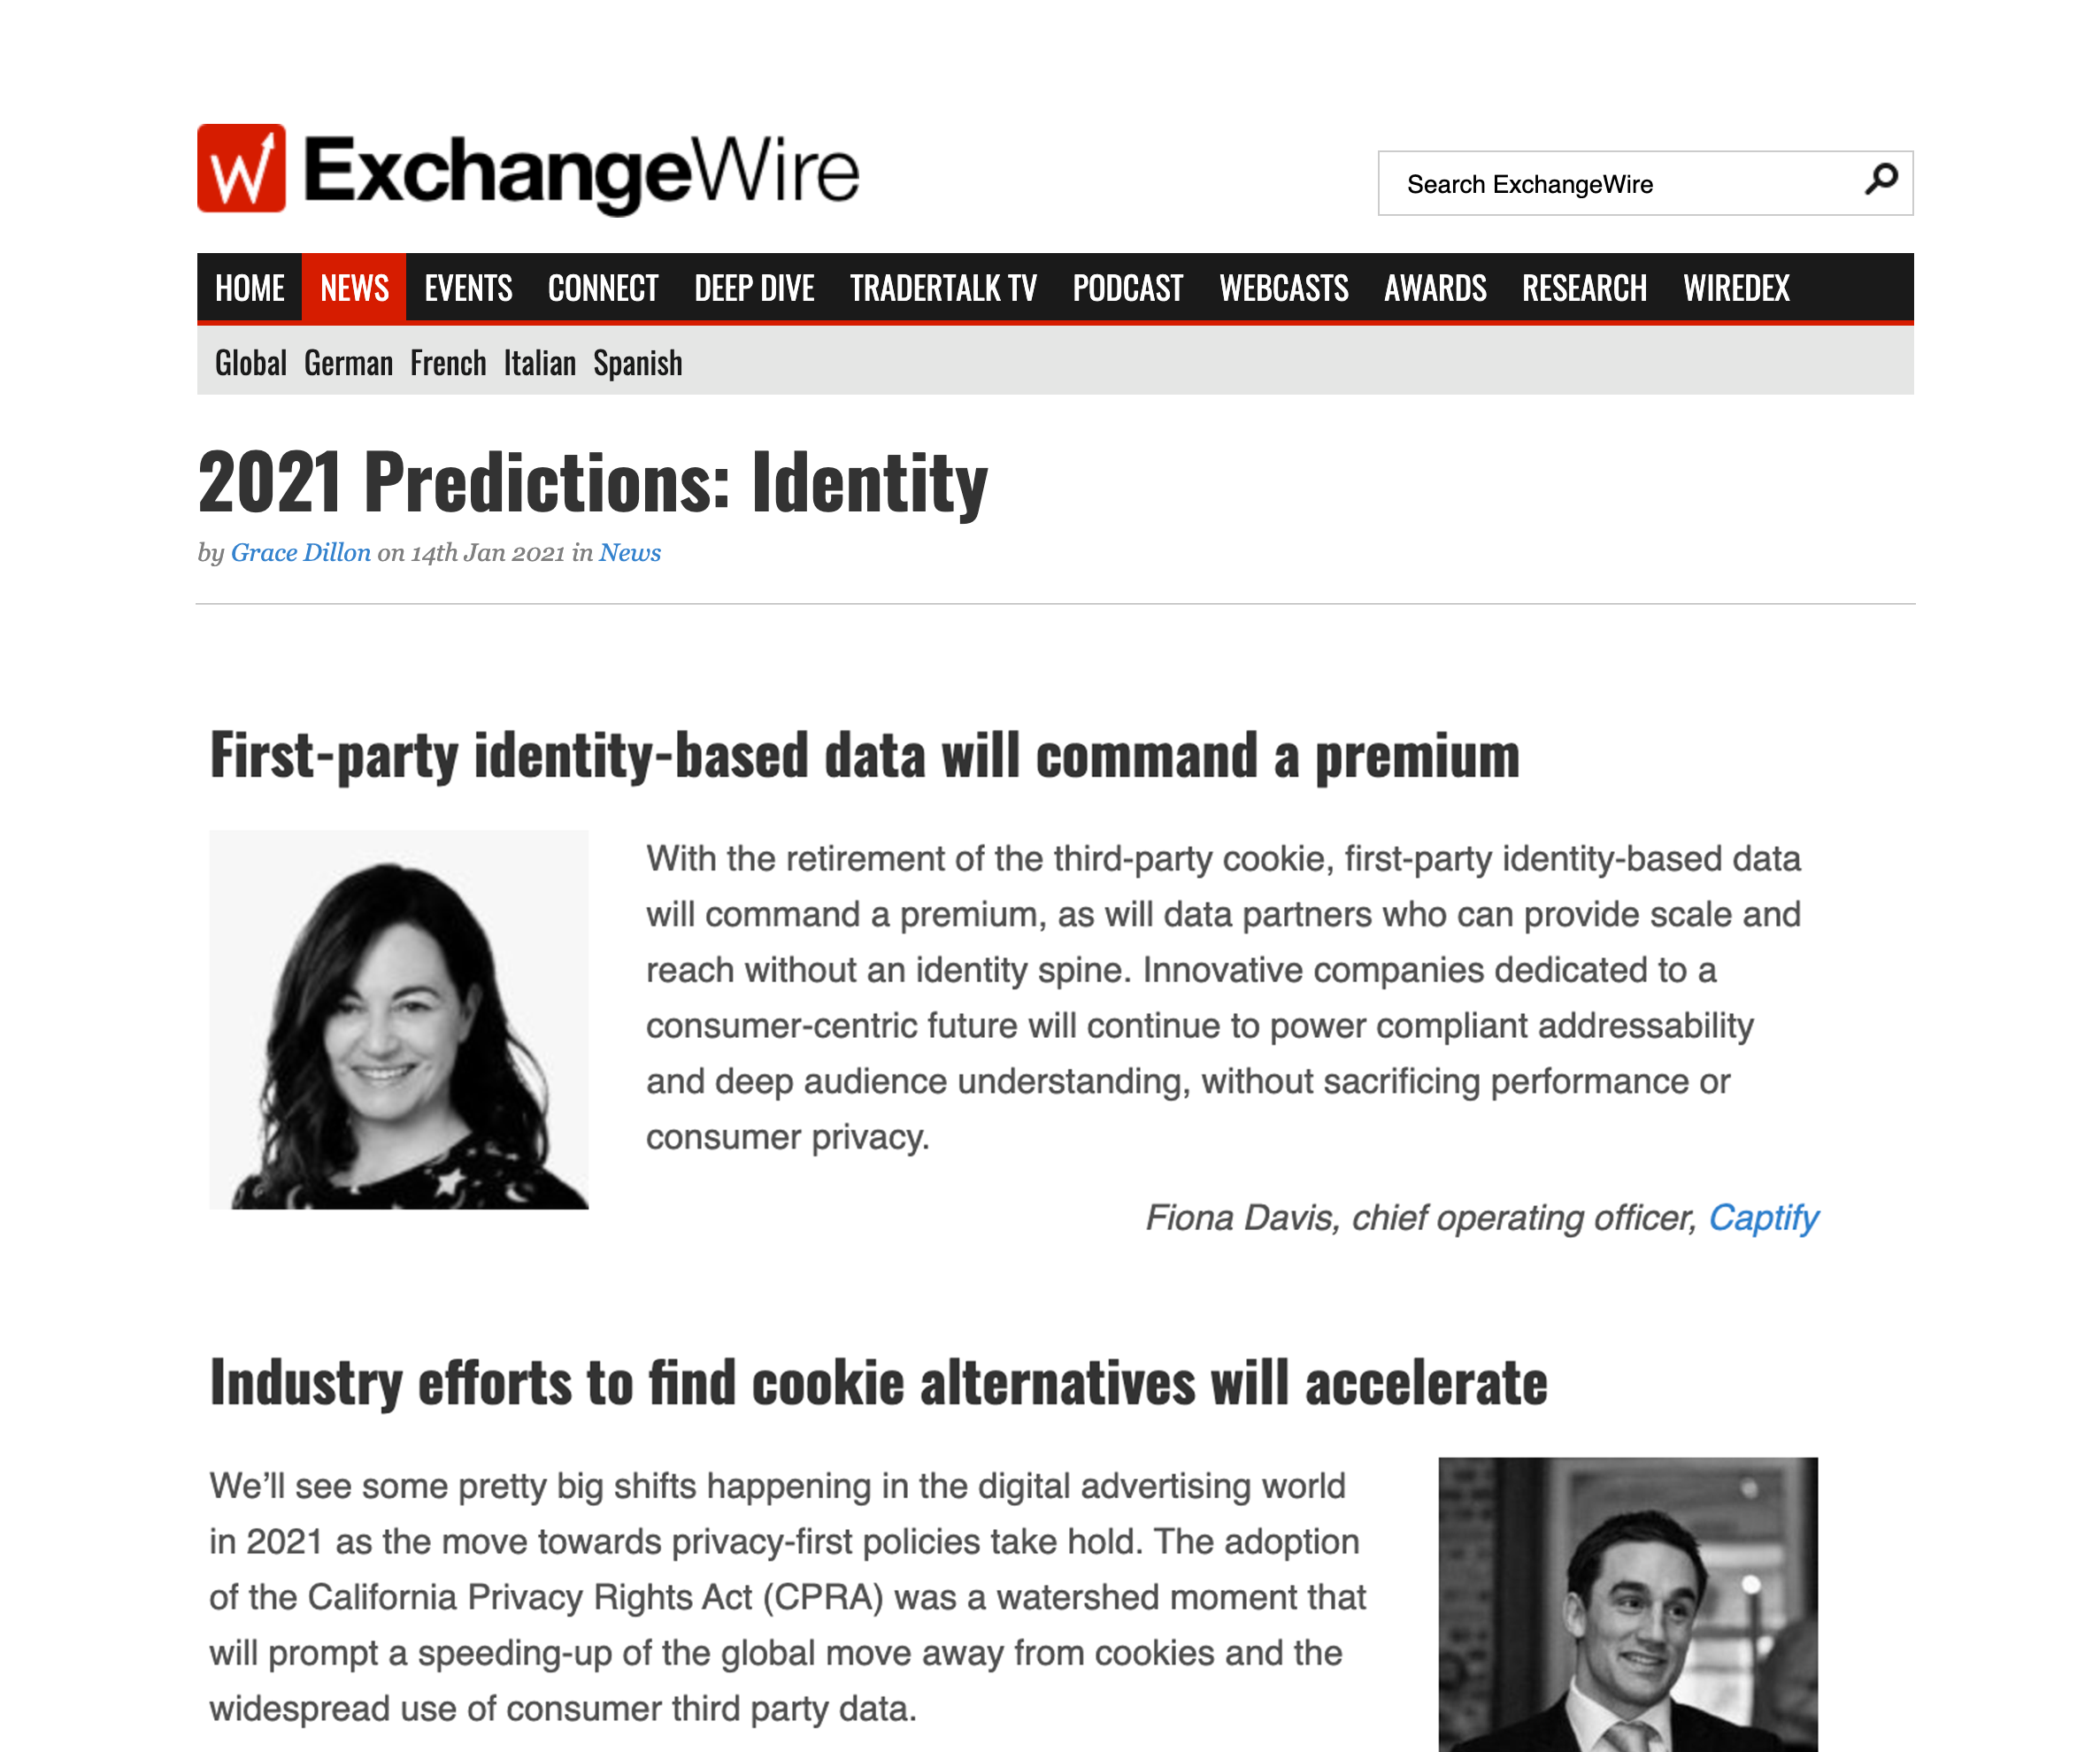 ExchangeWire: 2021 Predictions on Identity